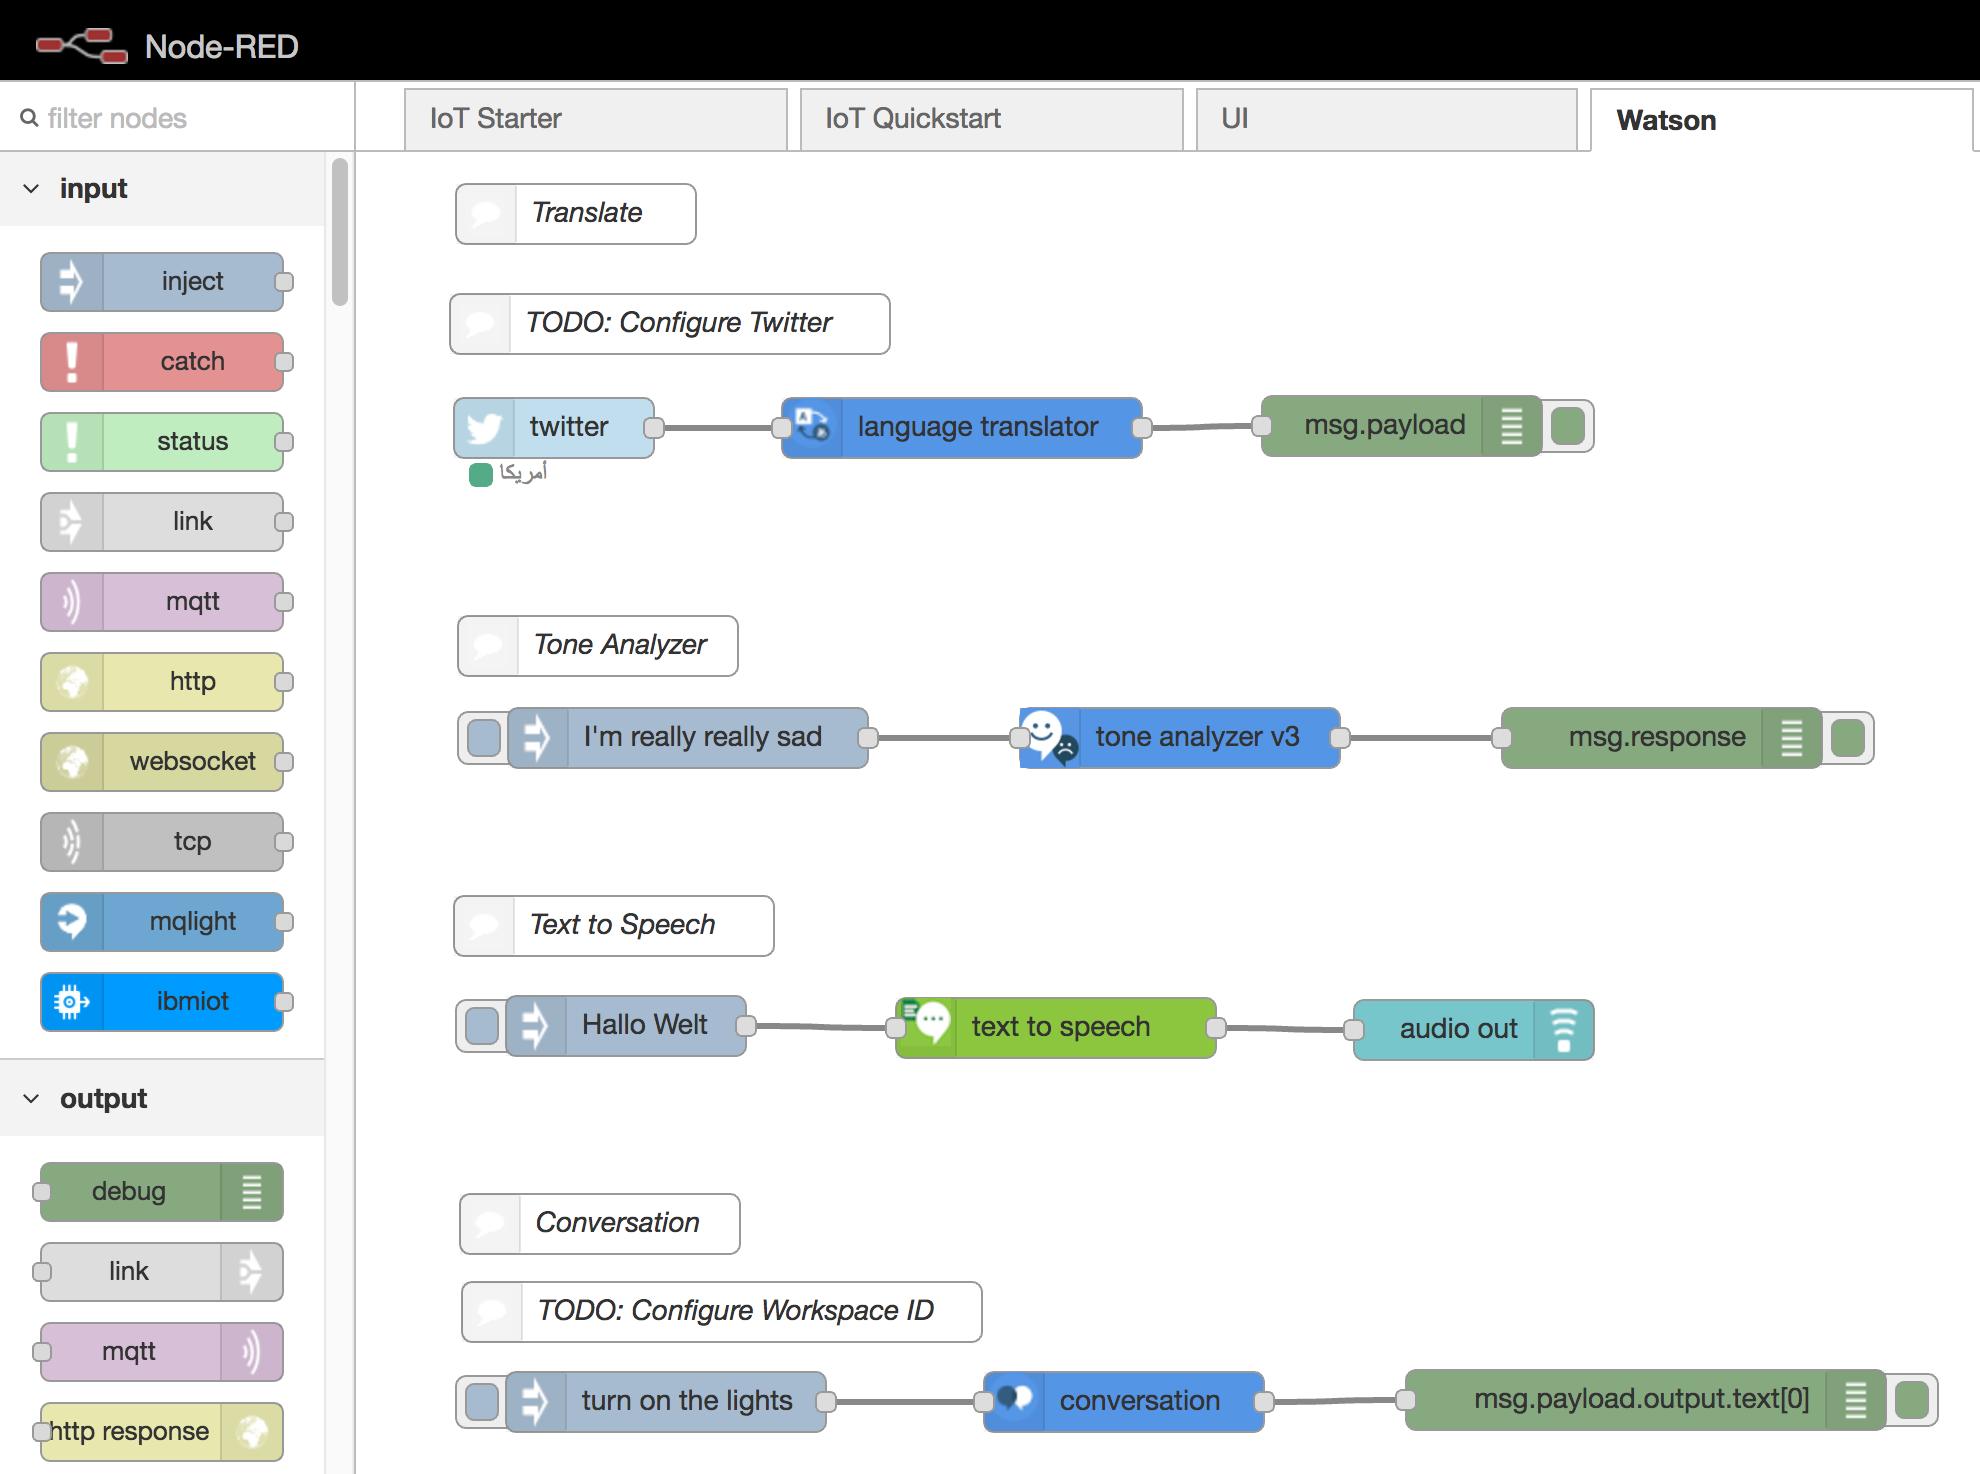 Node-RED Samples for IBM Watson IoT